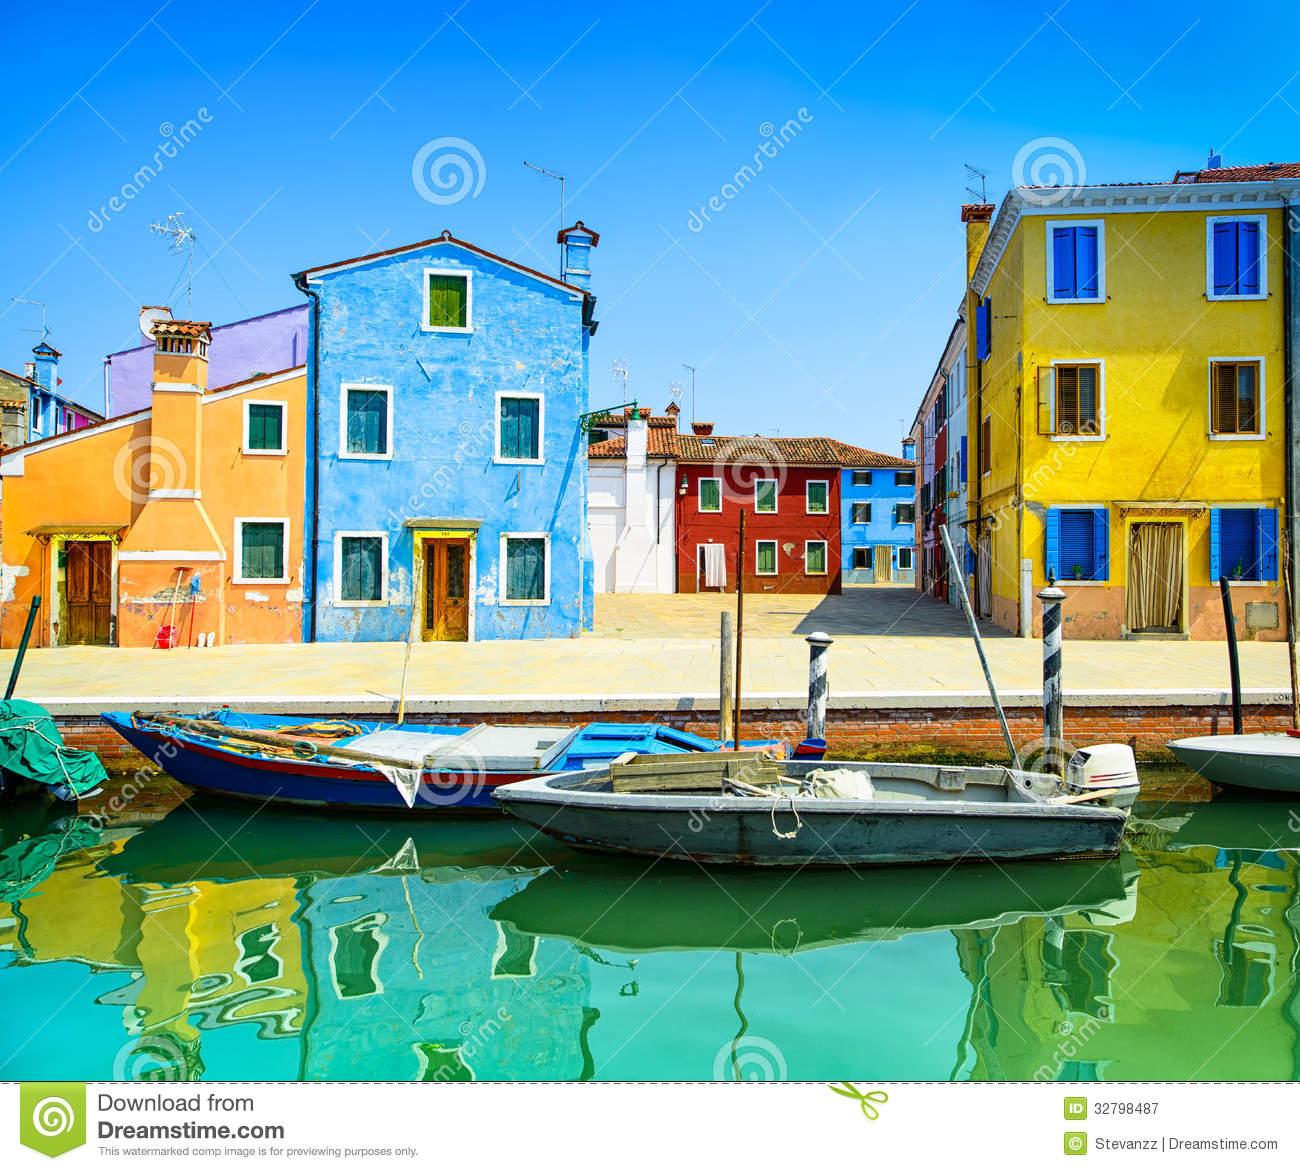 Venice Landmark, Burano Island Canal, Colorful Houses And Boats.